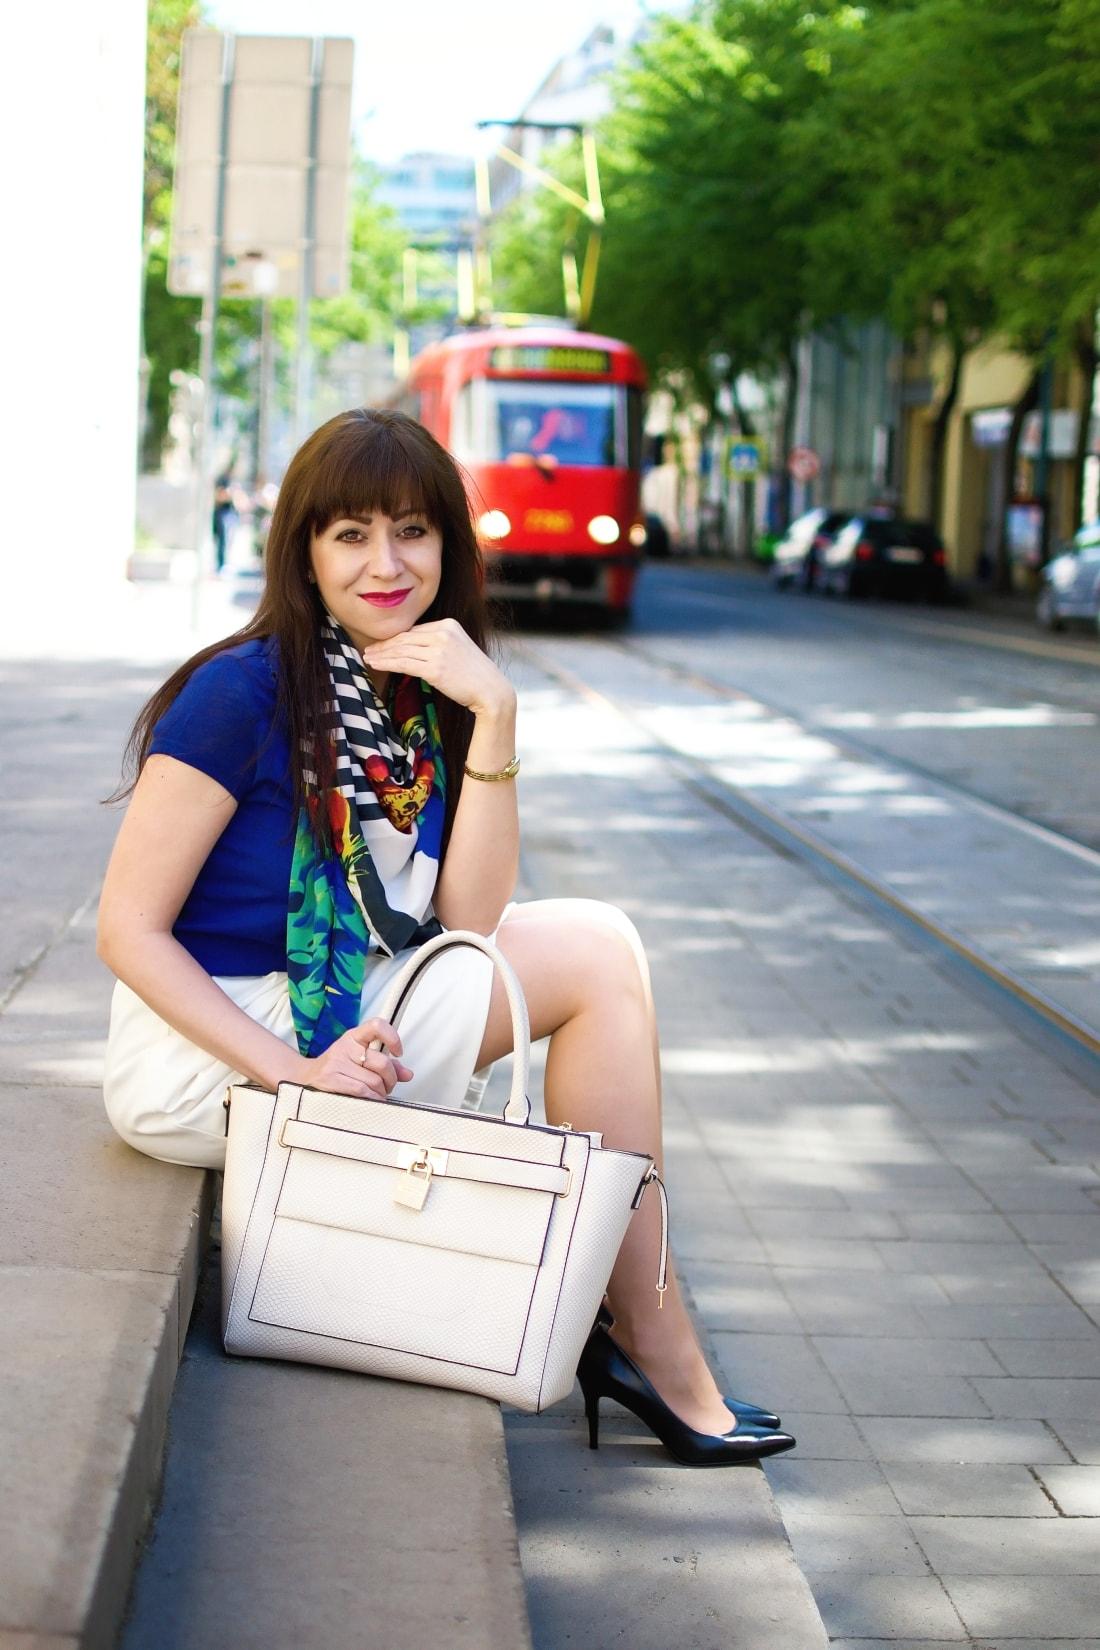 katharine-fashion-is-beautiful-blog-mix-kvetov-a-satka-8-blogger